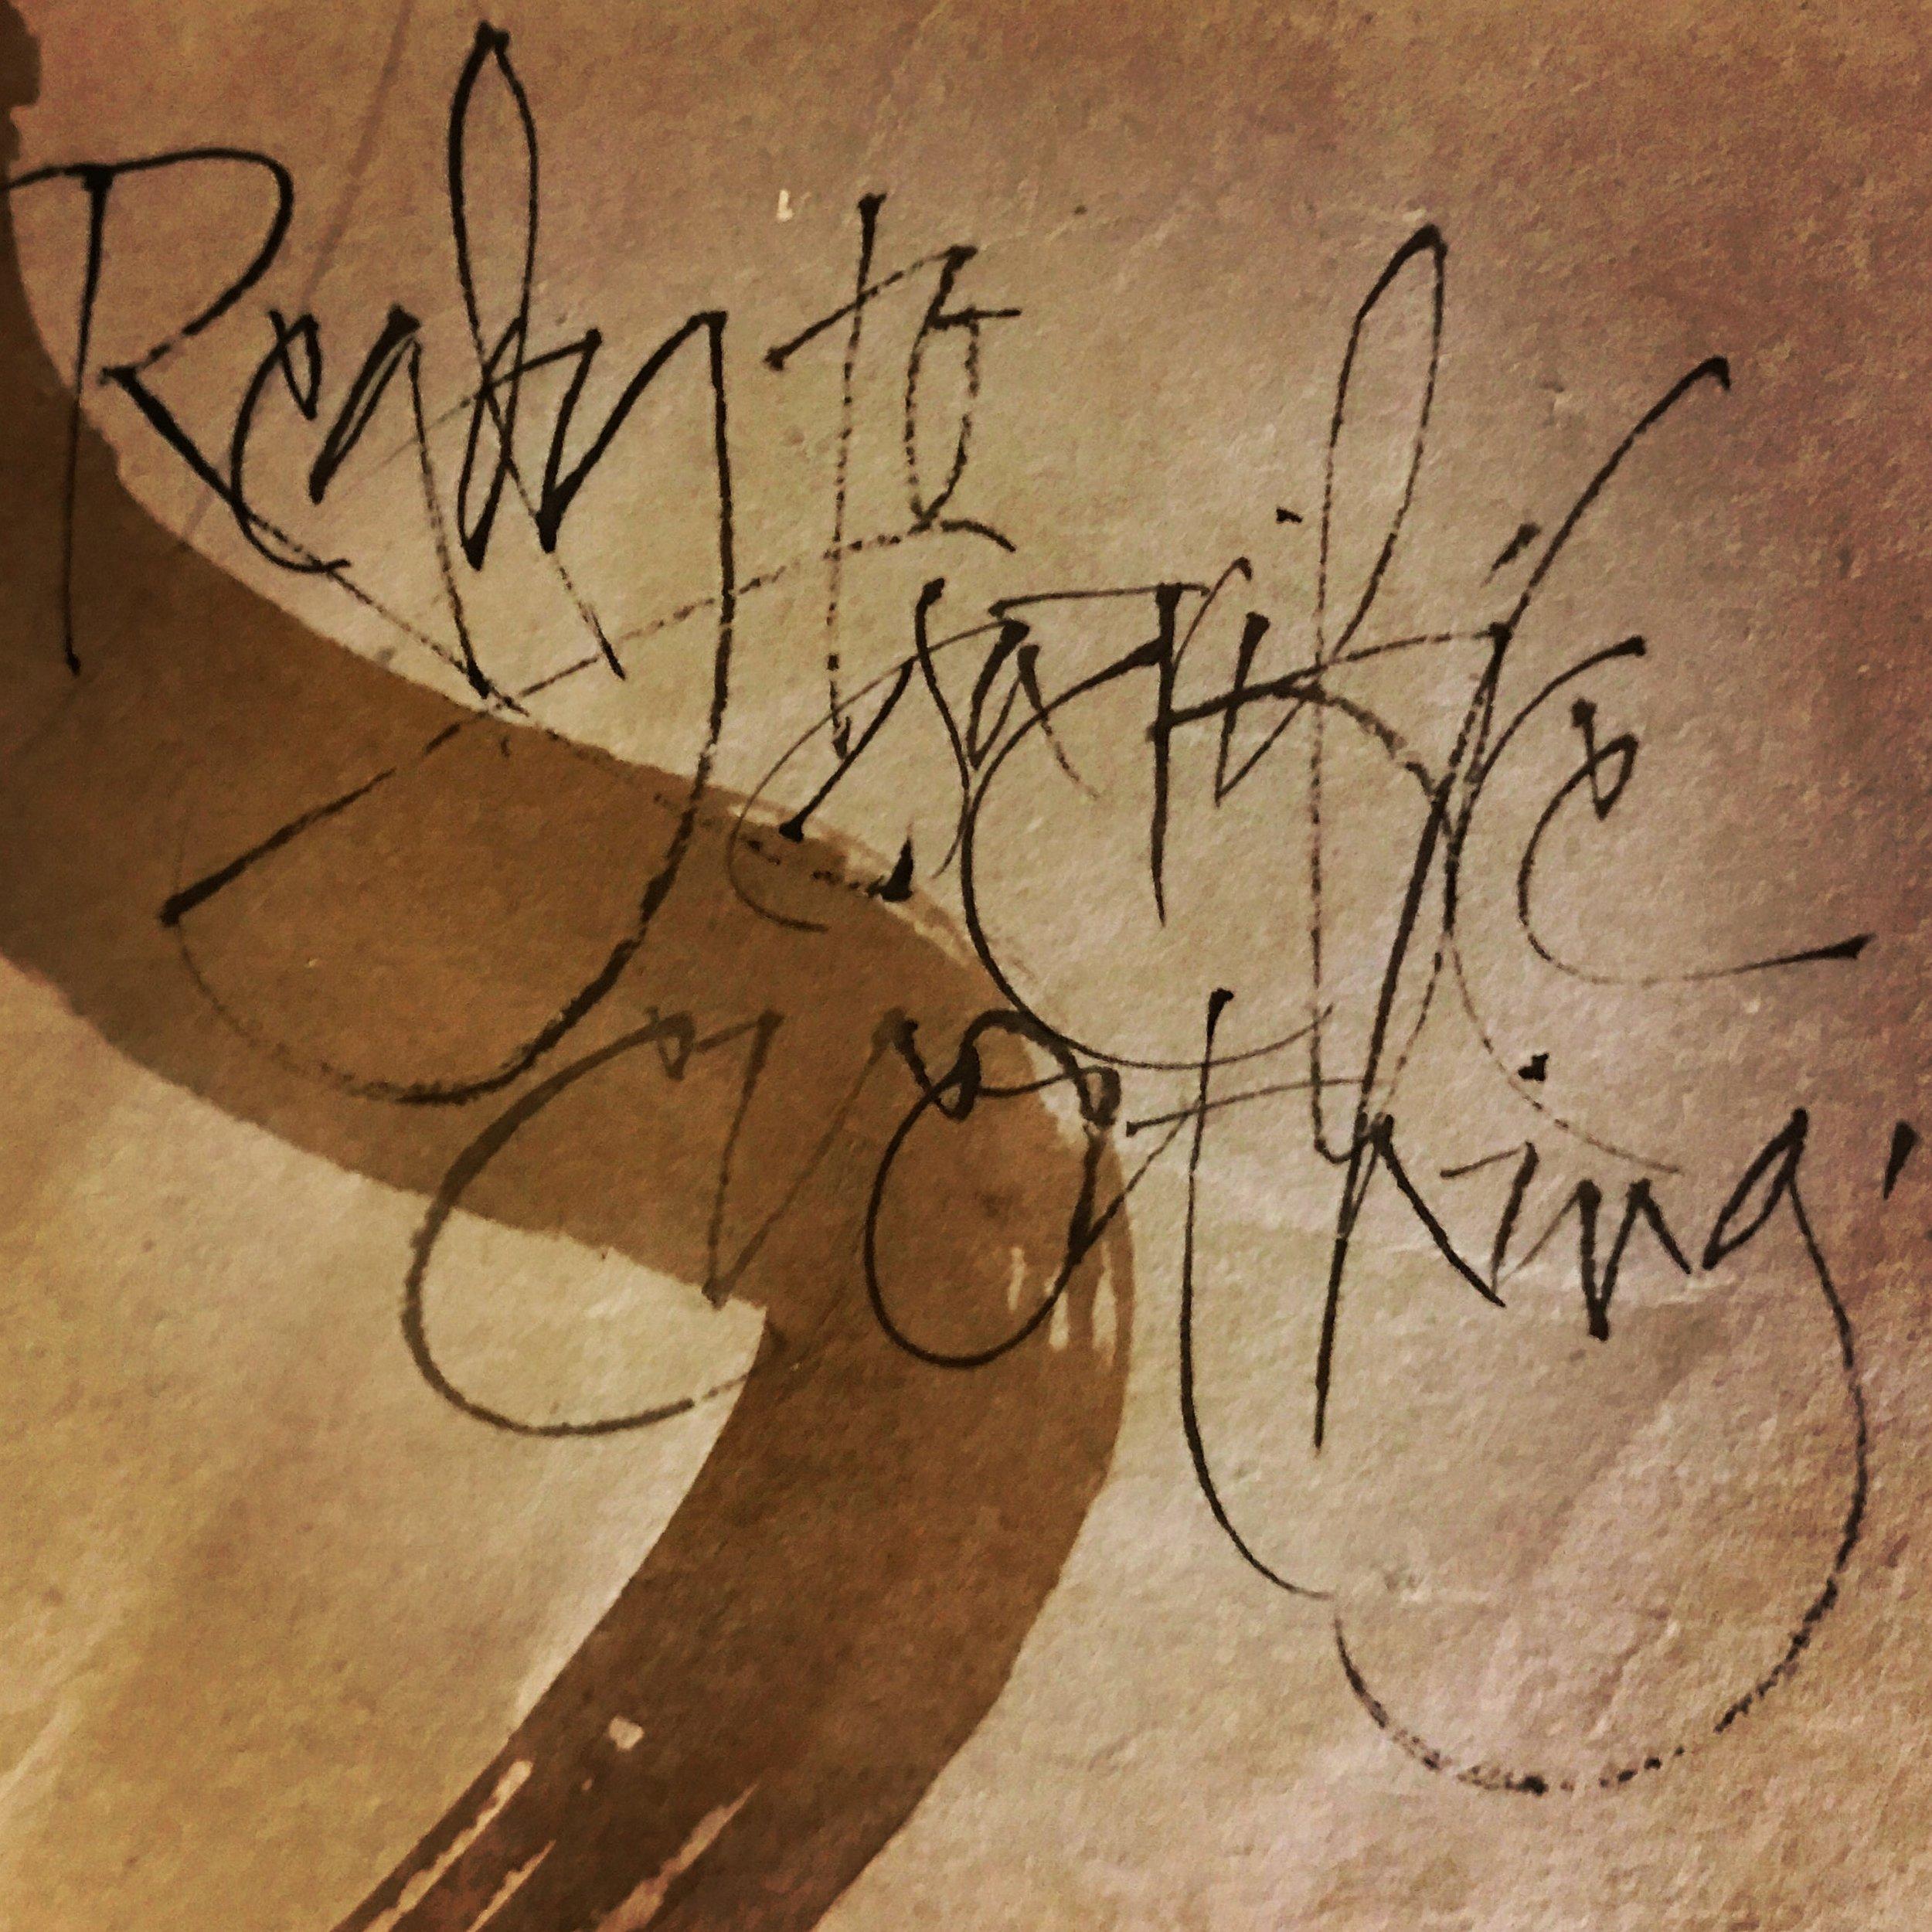 """Ready to sacrifice everything"" – Dostoyevsky, Brothers Karamazov  L Doctor Sketchbook"